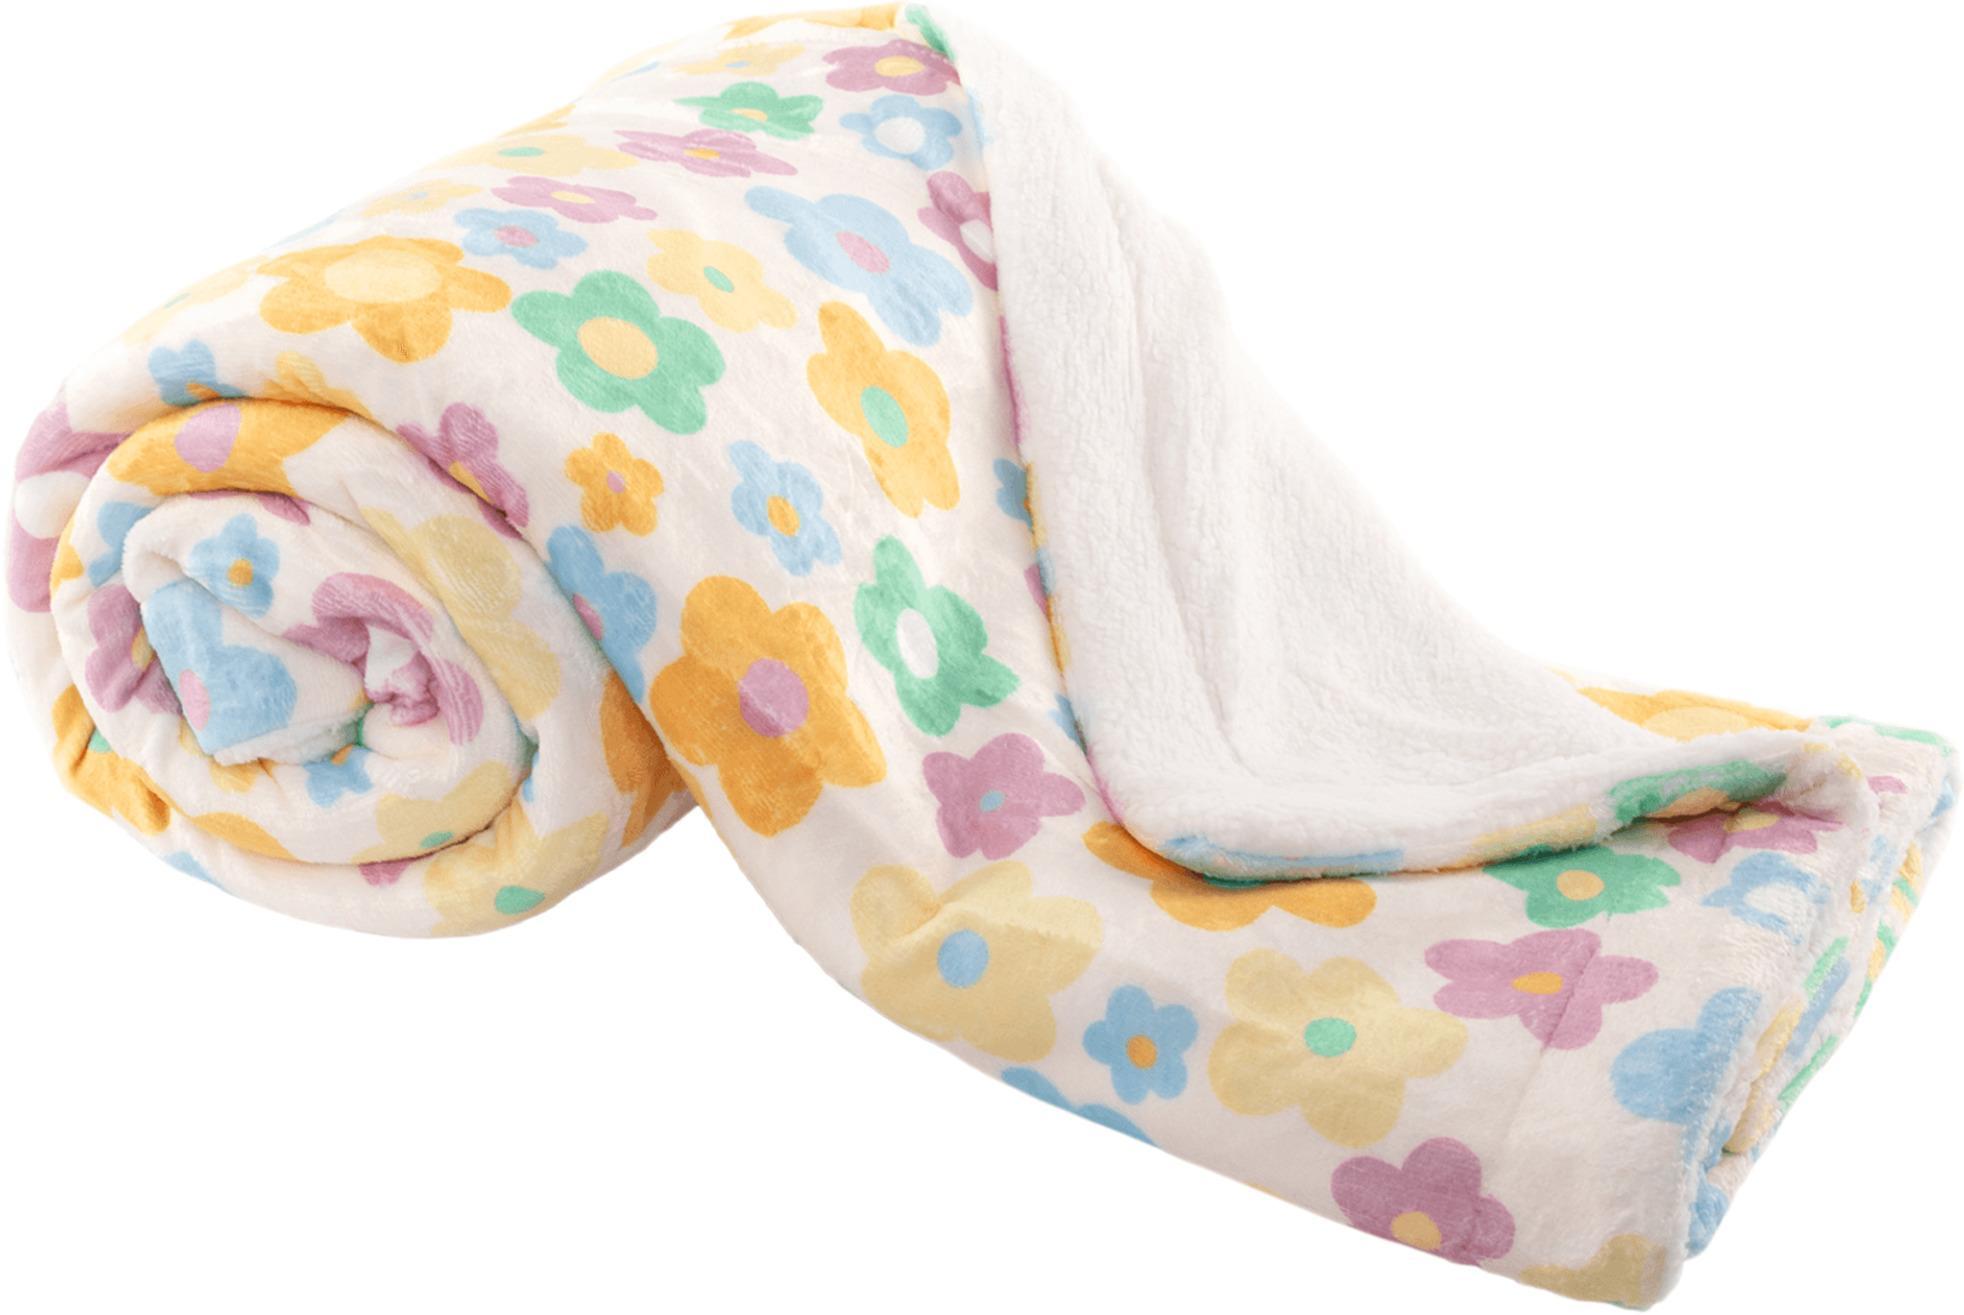 Obojstranná baránková deka, smotanová/vzor kvety, 150x200cm, ARDLE TYP1